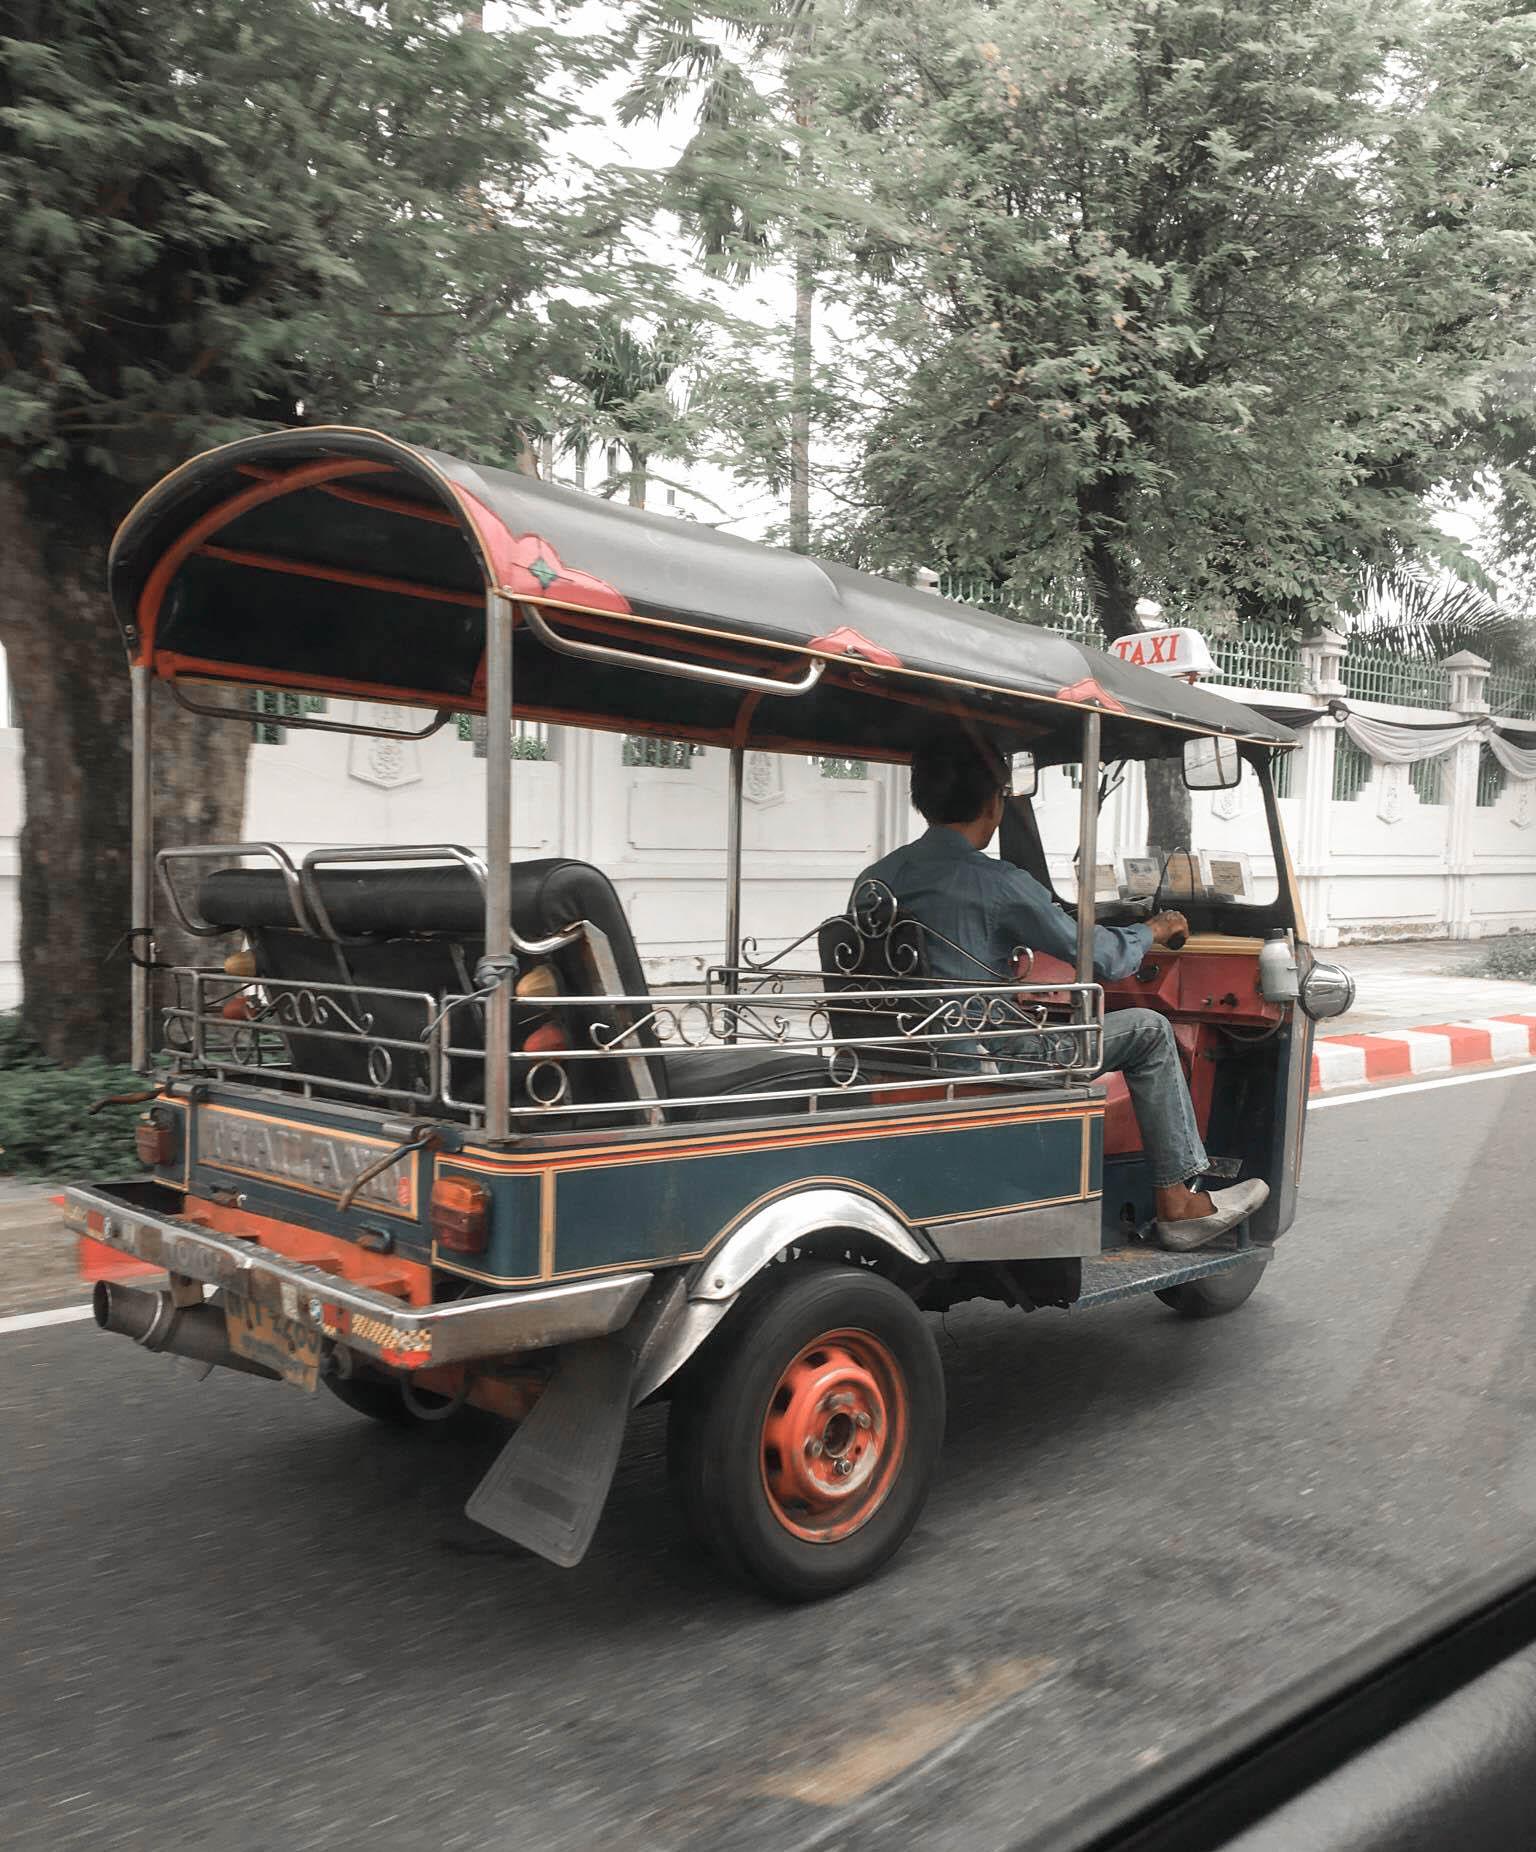 Tuk tuk dans la rue à Bangkok